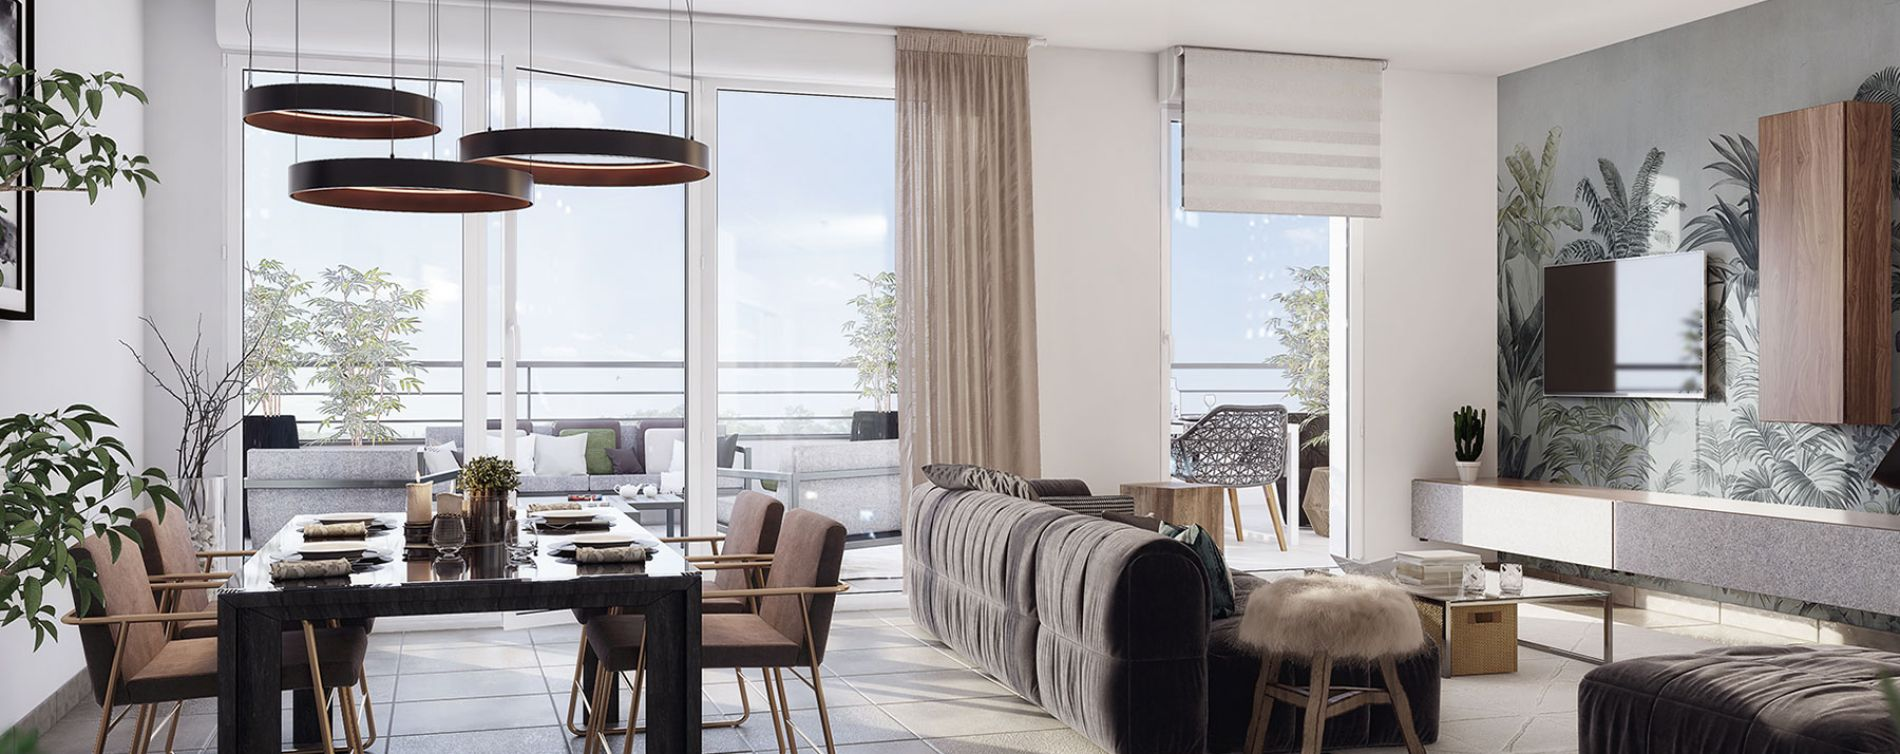 Meyreuil : programme immobilier neuve « Résidence Terra Verde » en Loi Pinel (2)